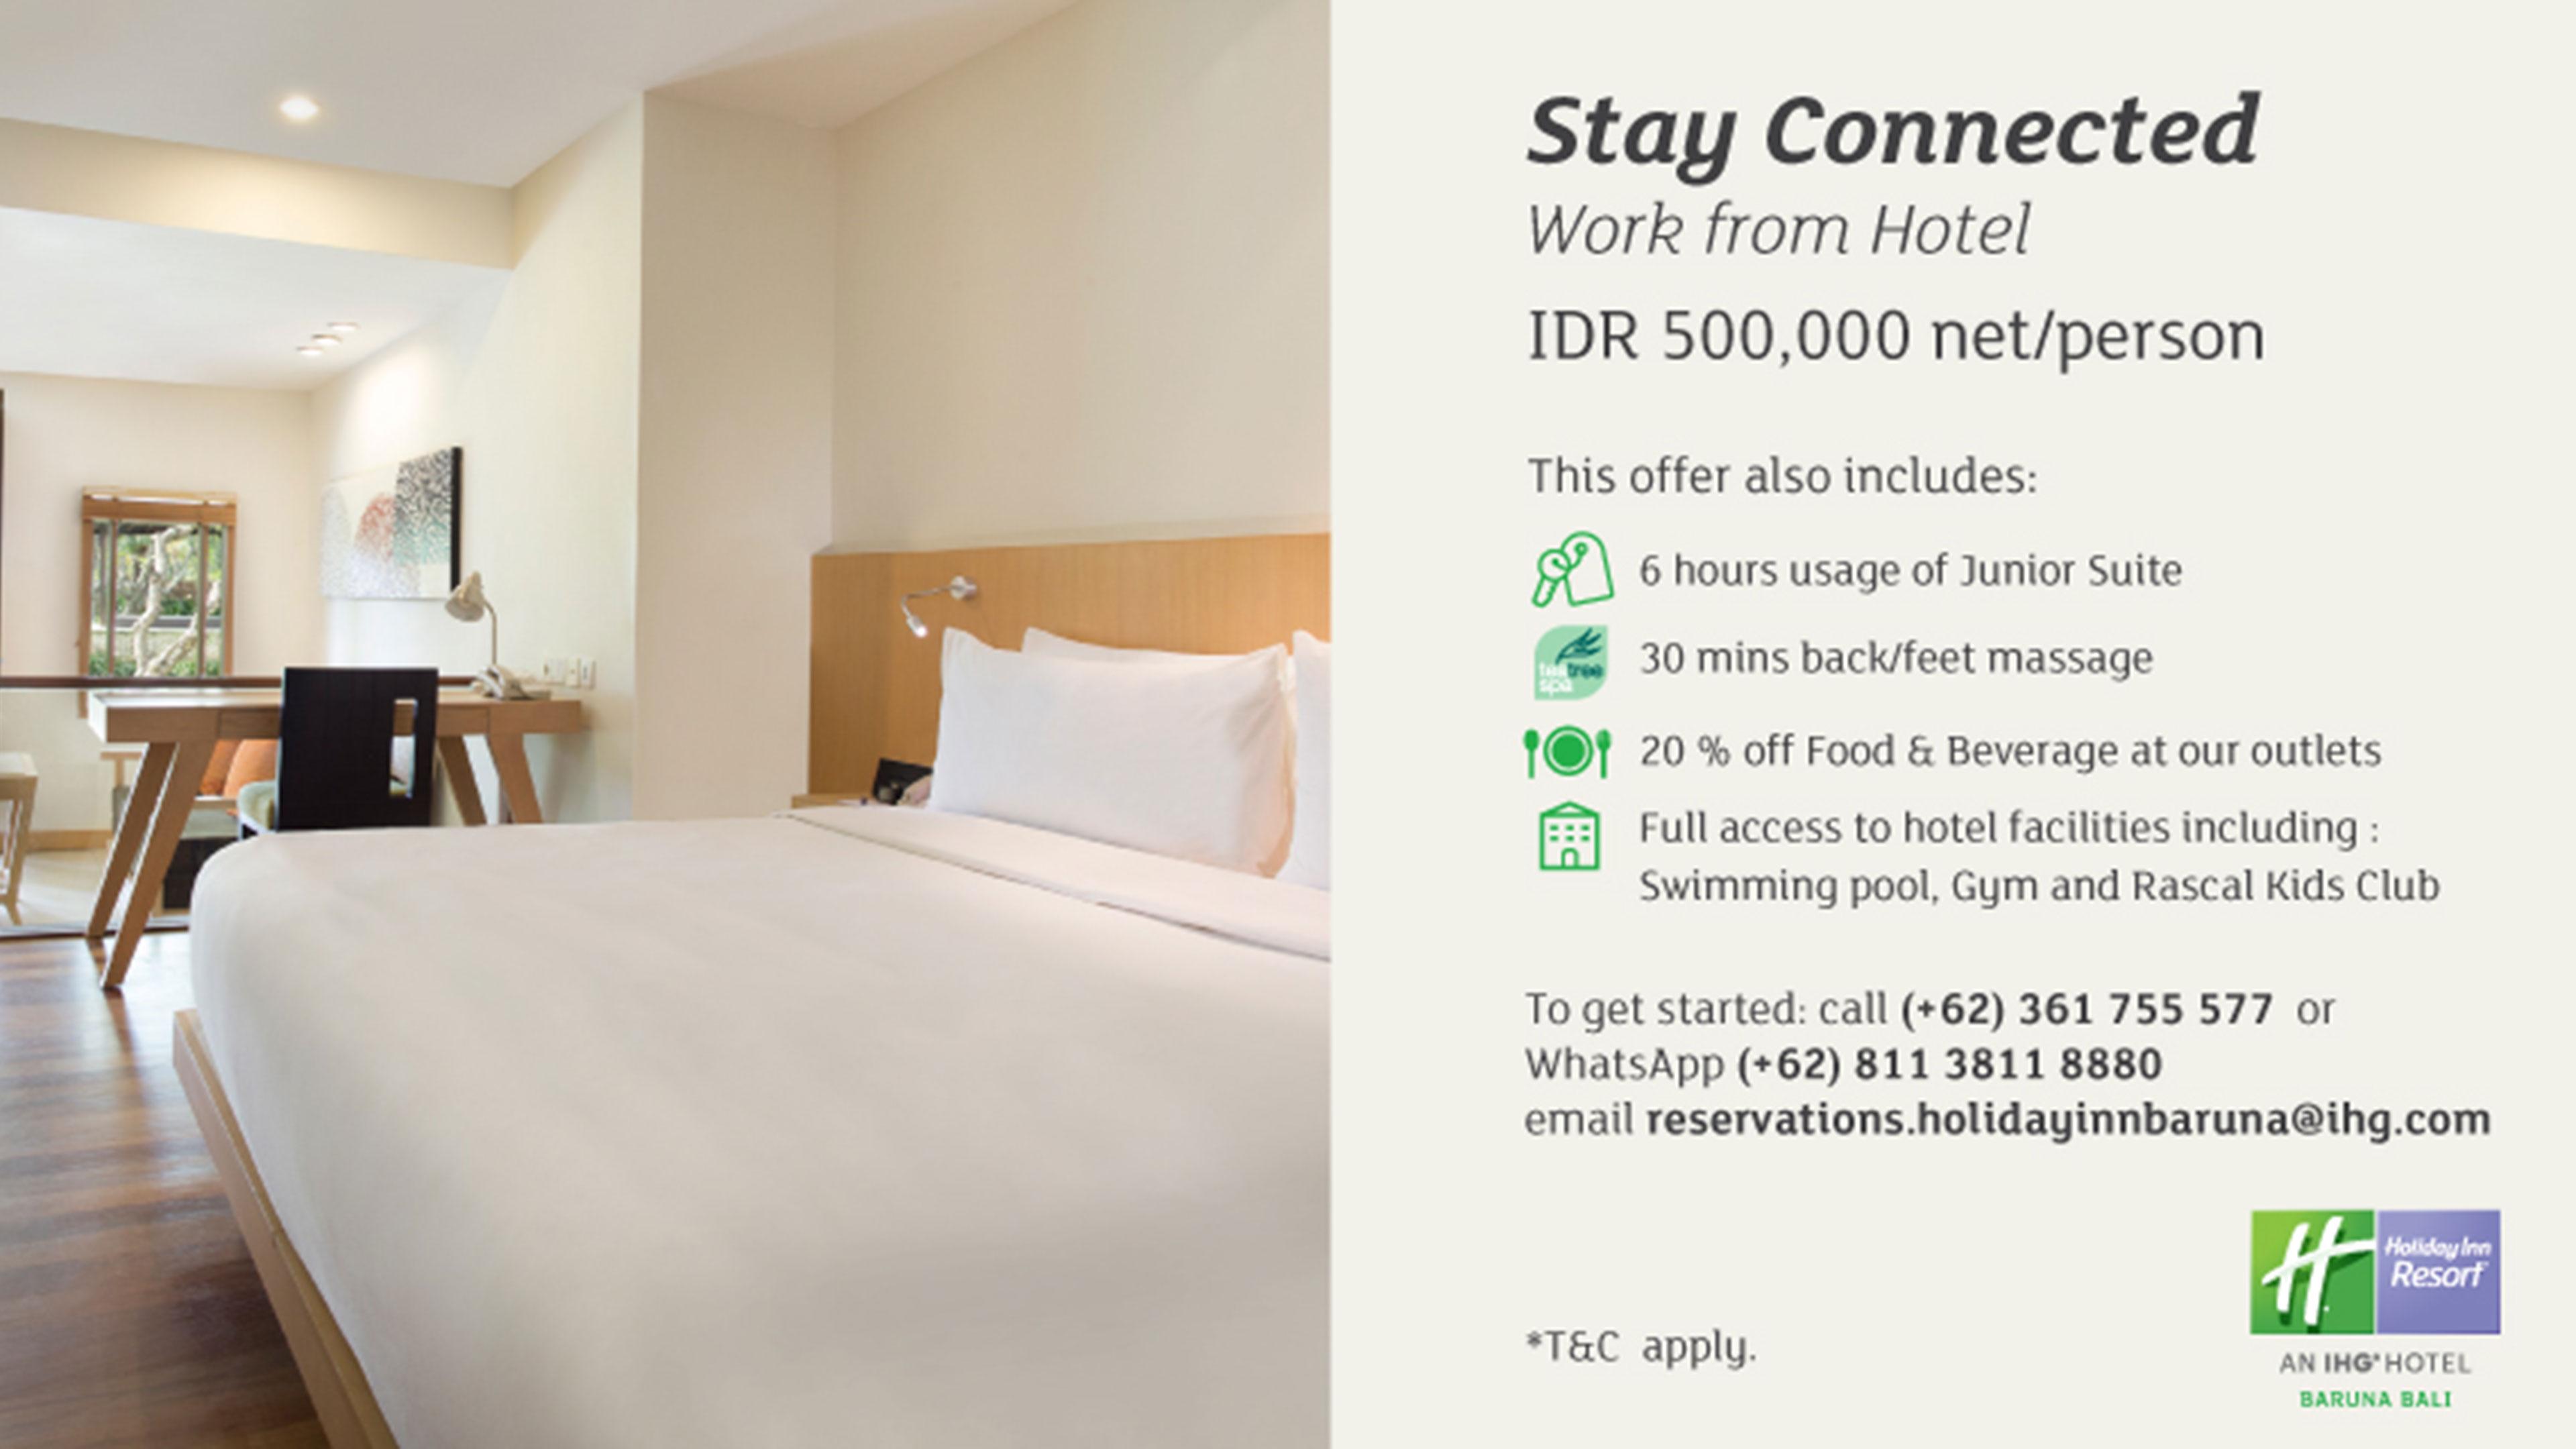 Work_From_Hotel_Holiday_Inn_Resort_Baruna_Bali